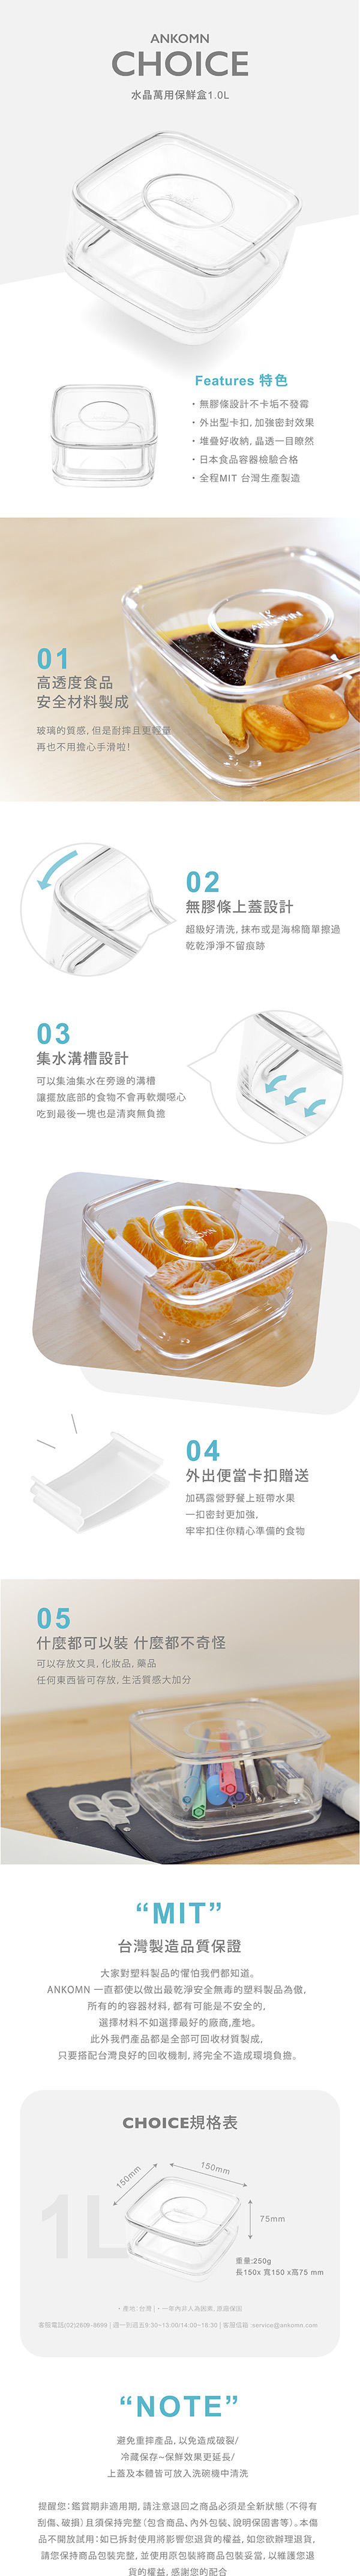 ANKOMN|CHOICE 萬用盒 1公升 (2入組)